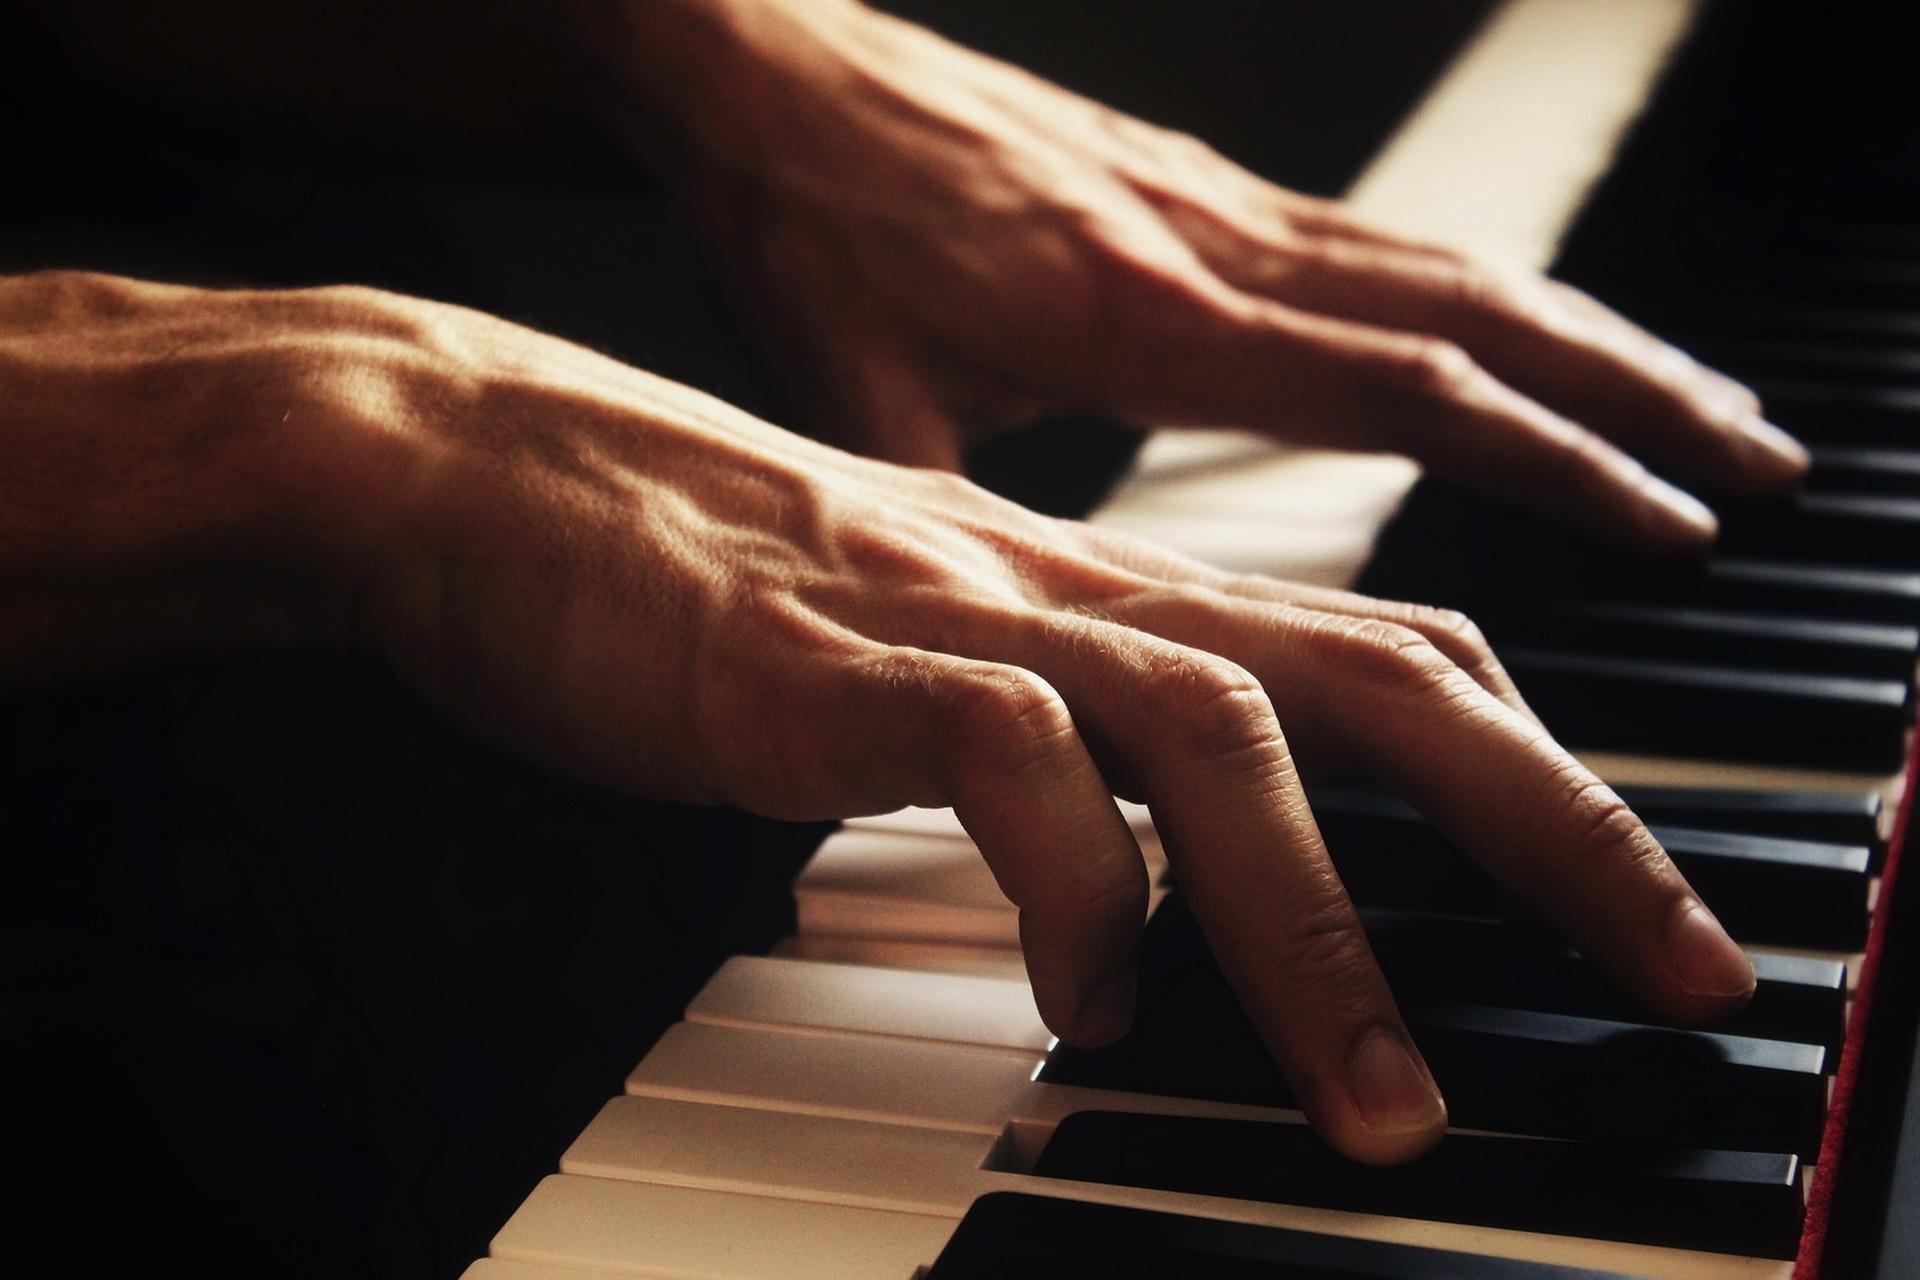 Картинка рука на пианино